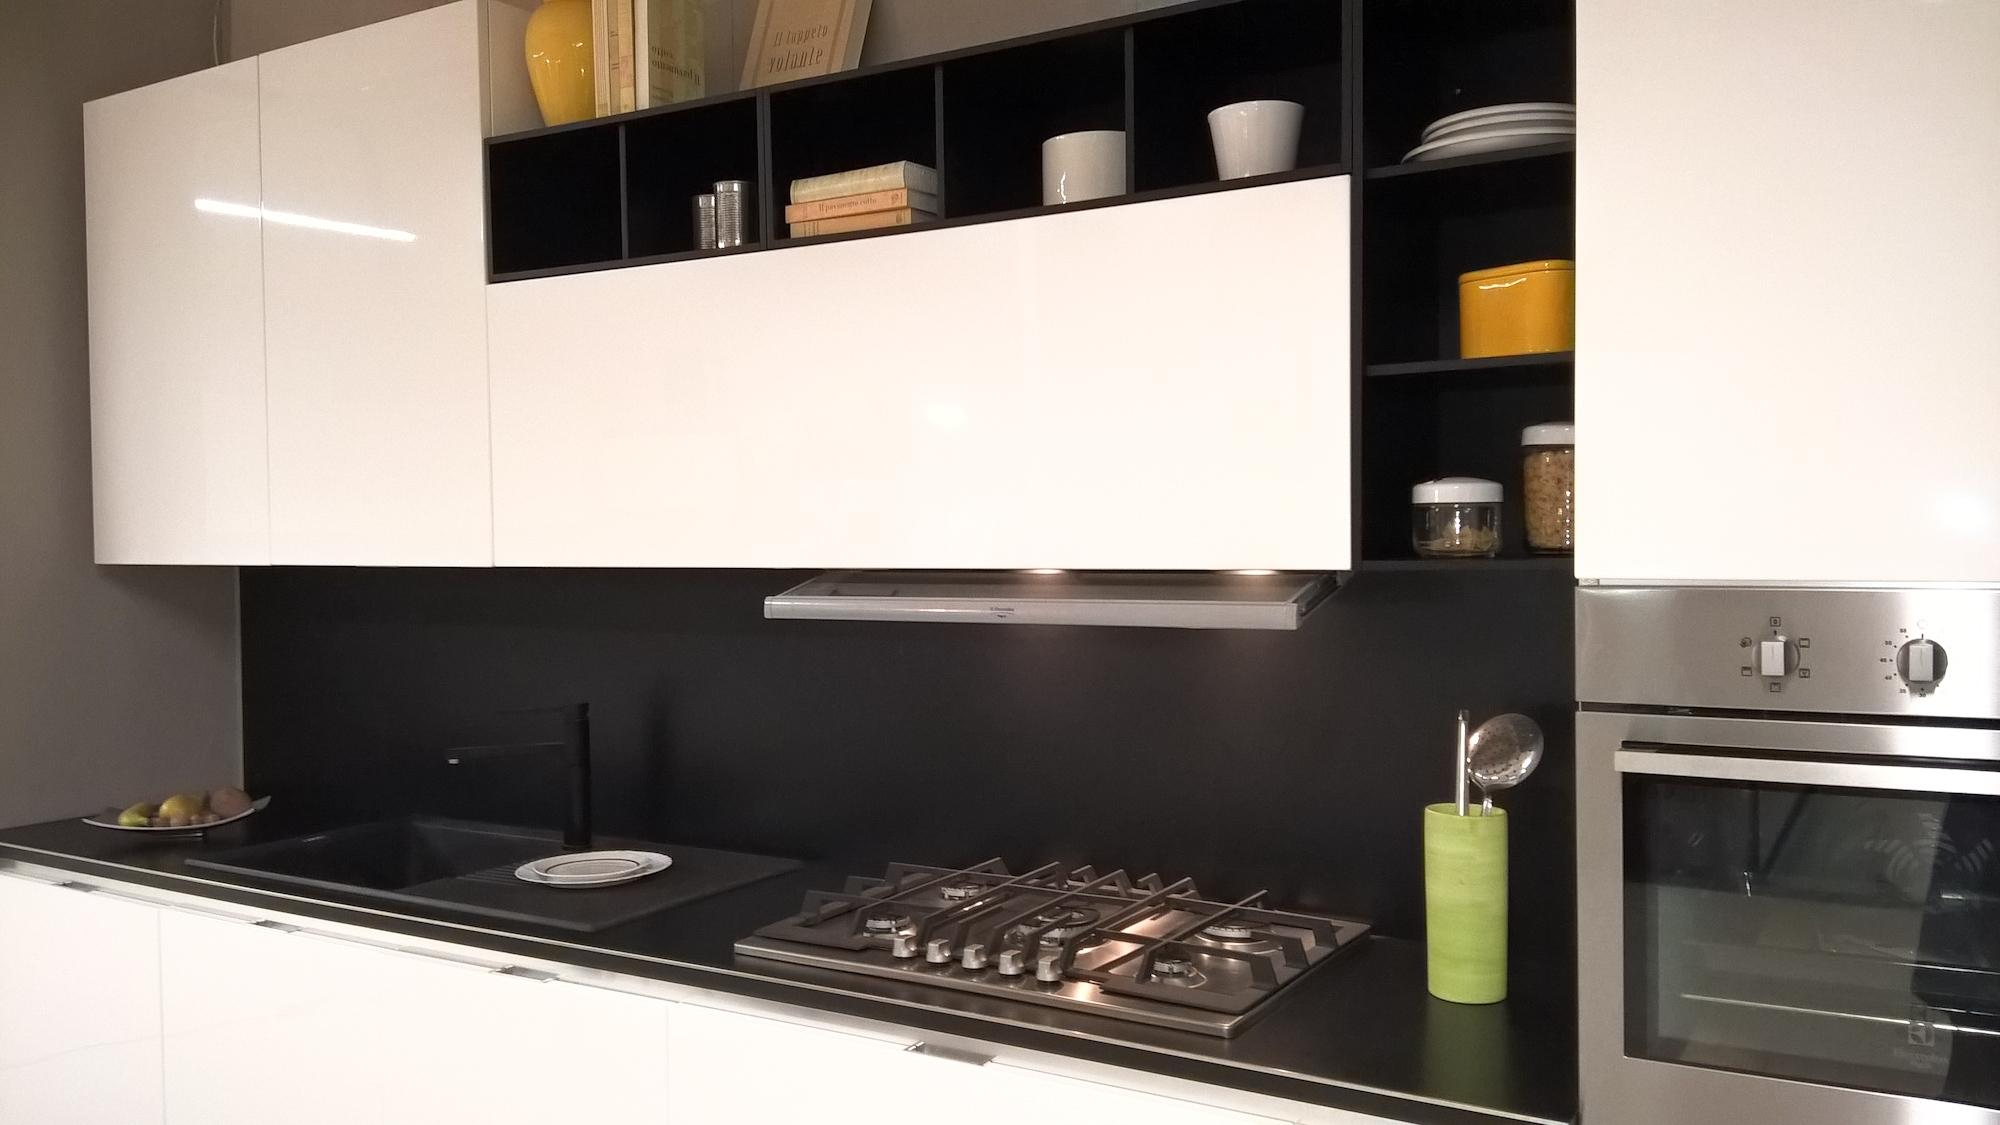 Cucina bianca con forno nero plano menu cucina bianca lucida con